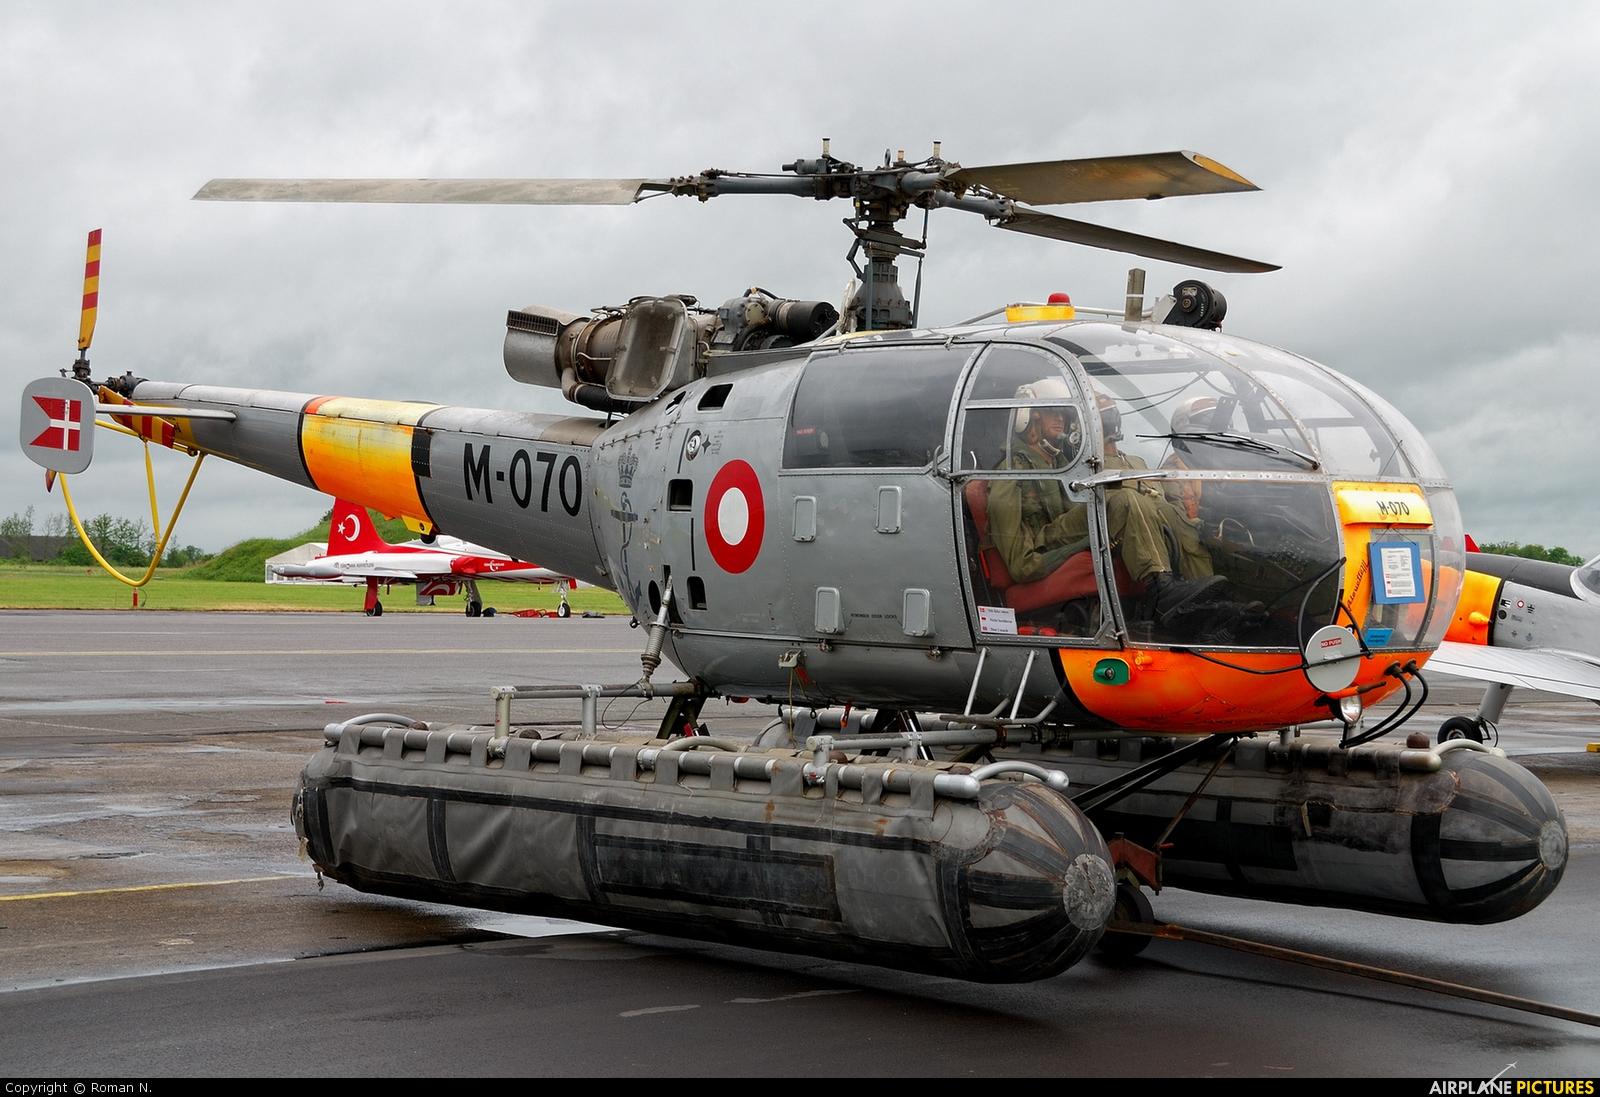 Denmark - Navy M-070 aircraft at Aalborg